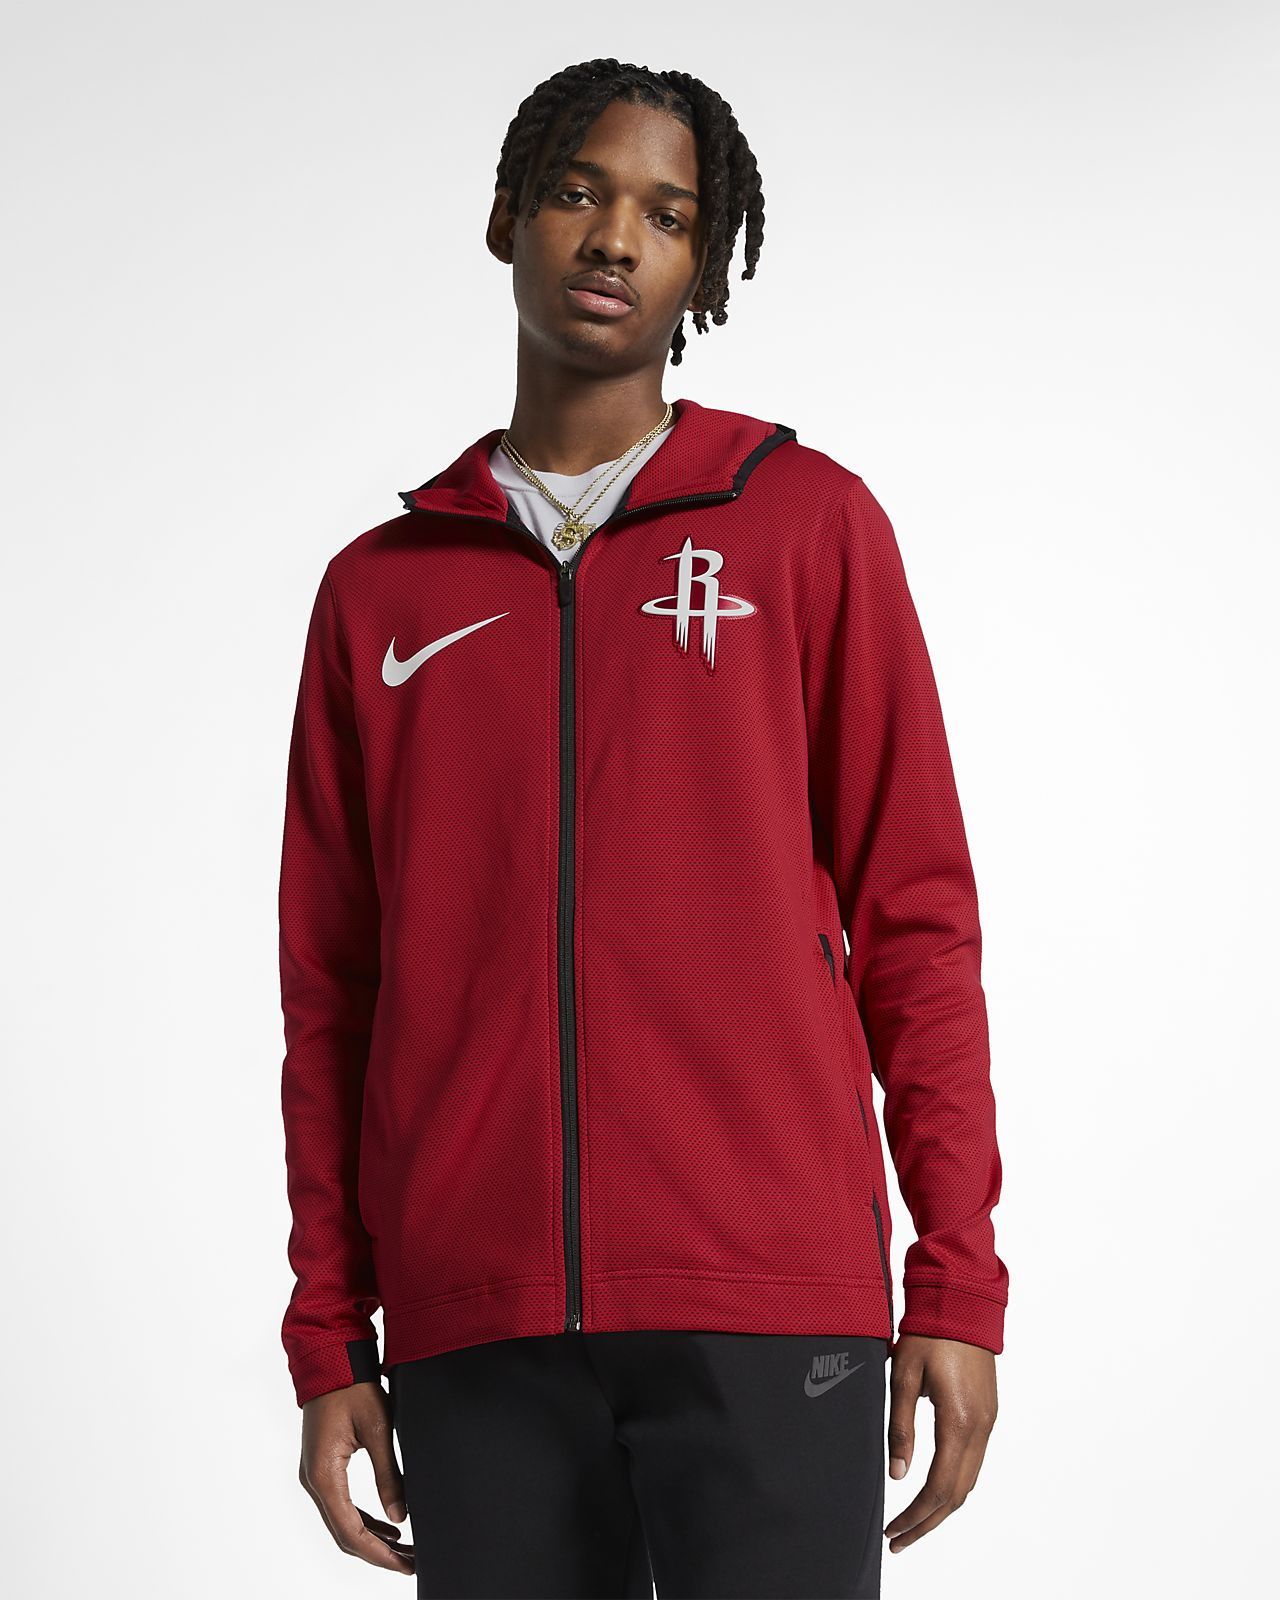 Con Nba Hombre Houston Showtime Sudadera Therma Rockets De La Capucha Flex Nike 4Pqf4Y